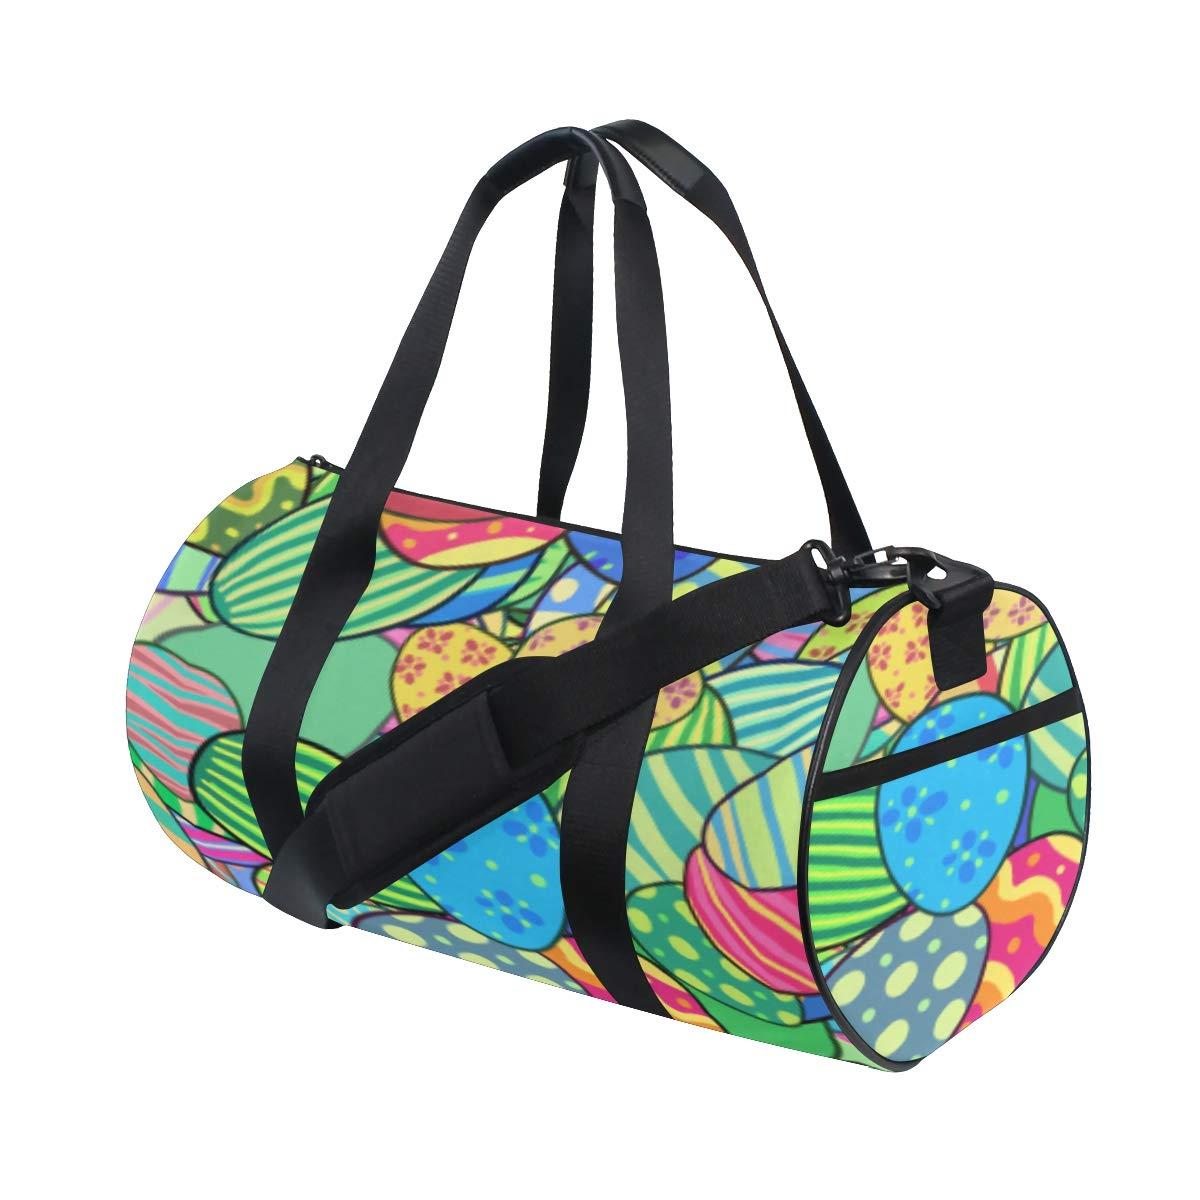 be3cea194c66 Amazon.com: Handbags Daily Eggs Colorful Funny Cute Weekender Bag ...